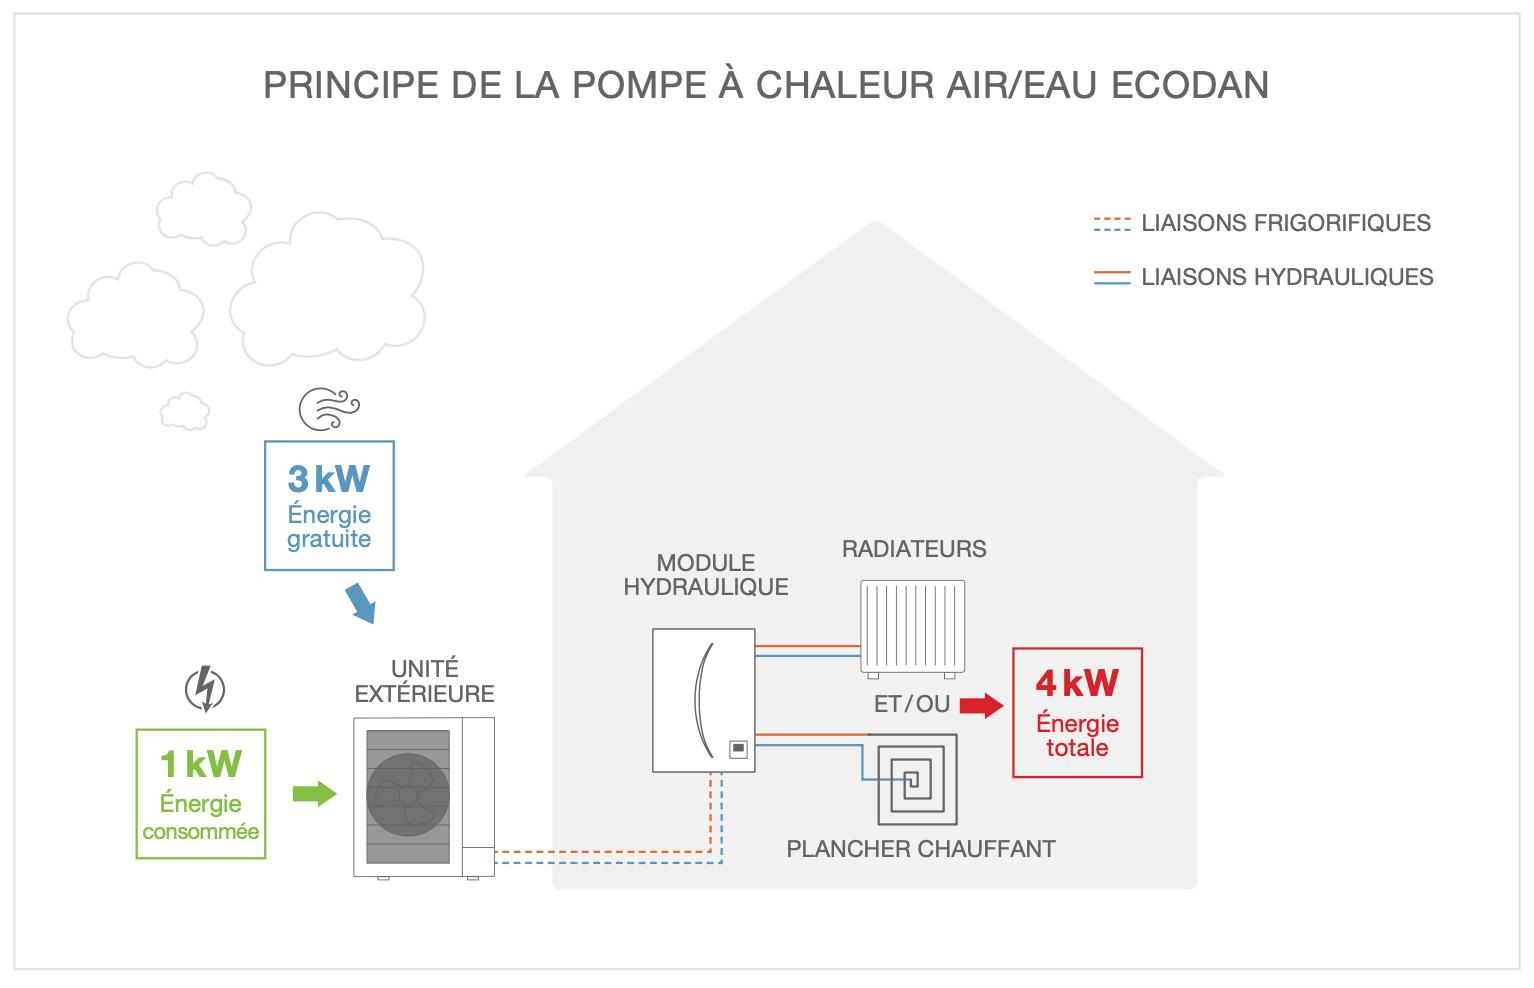 Principe de la pompe à chaleur air/eau Ecodan Zubadan R32 Silence